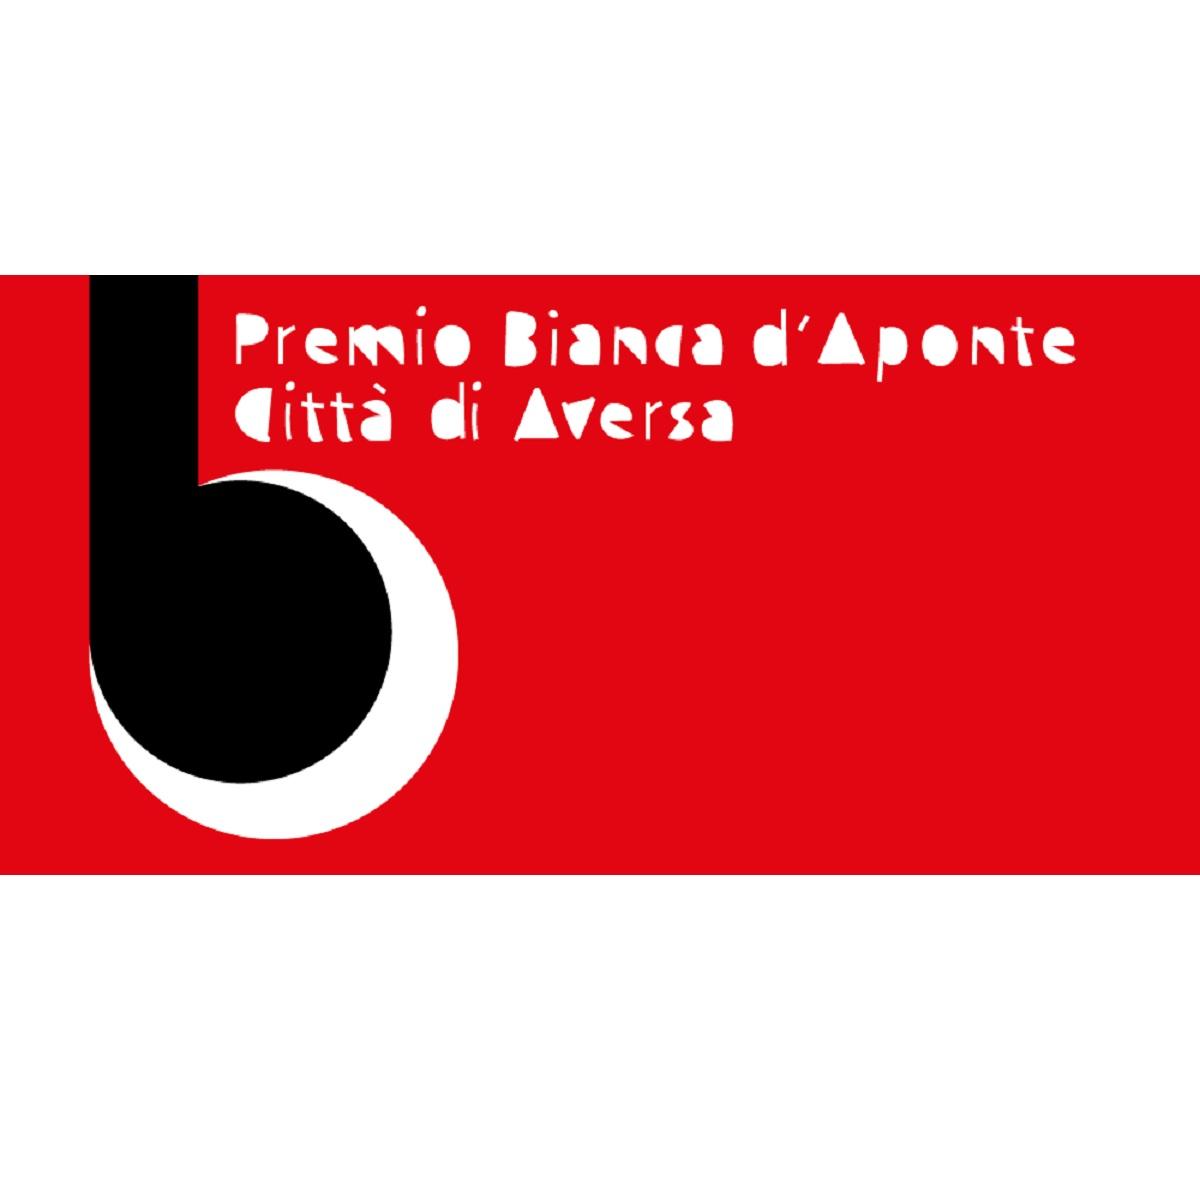 Il Premio Bianca d'Aponte ad Aversa foto